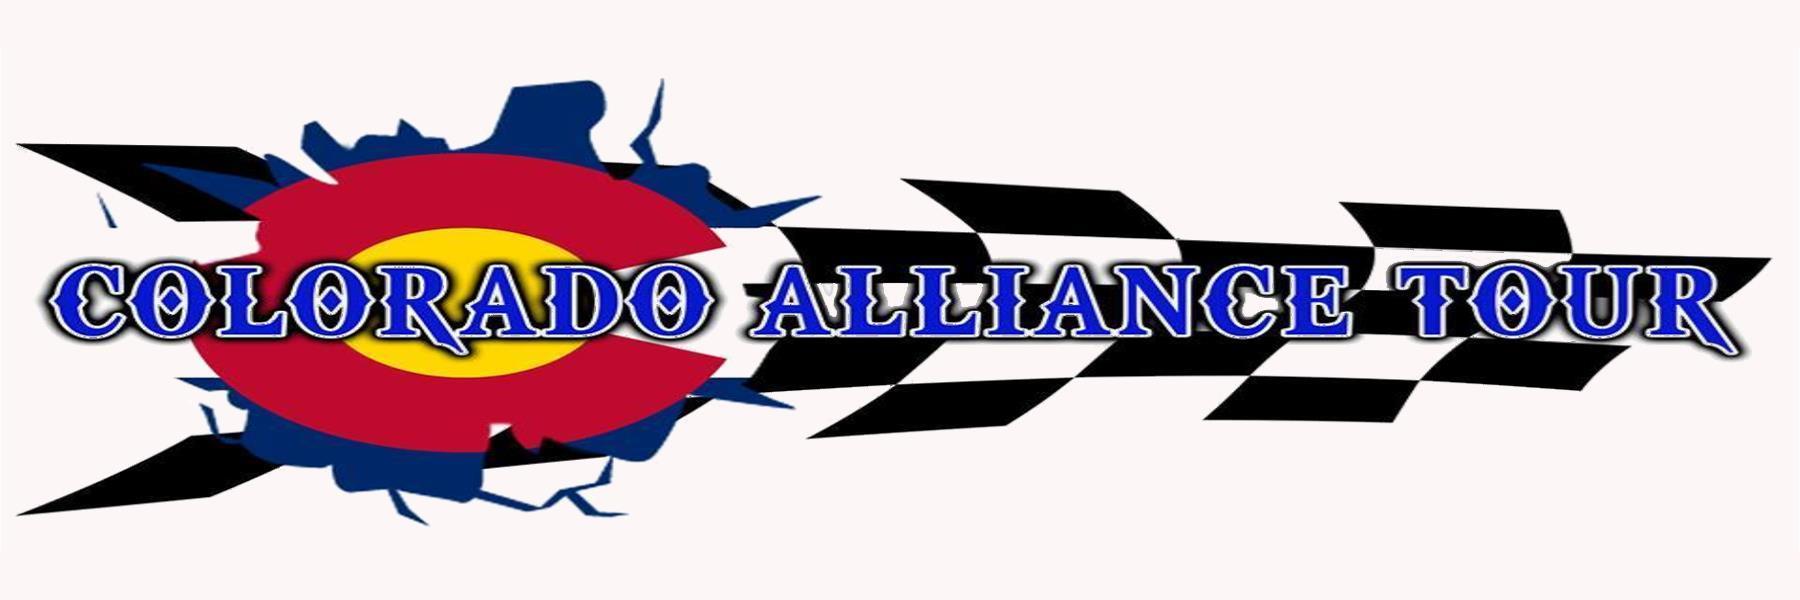 Colorado Alliance Tour